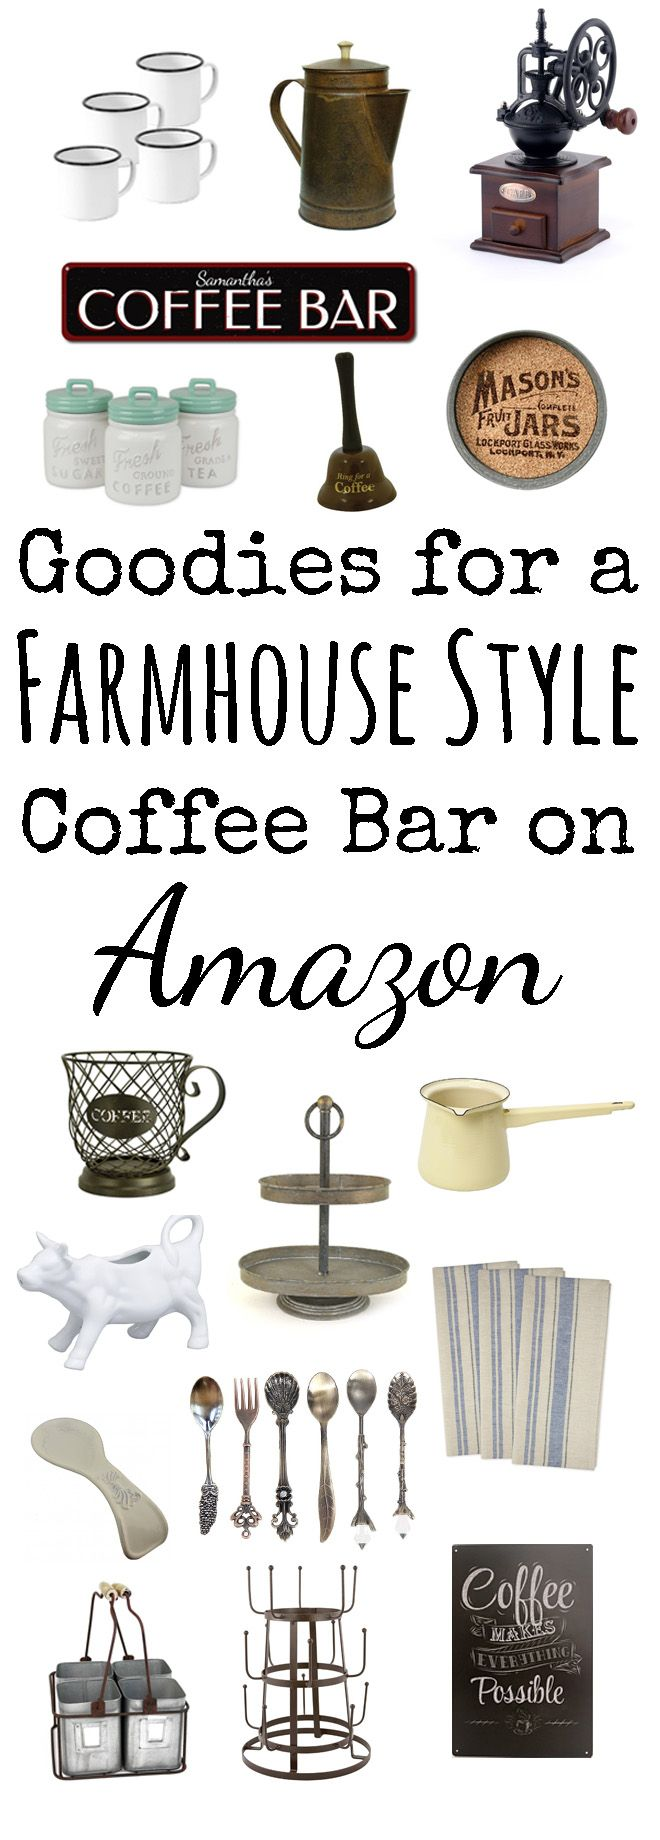 Goodies for a Farmhouse Style Coffee Bar on Amazon